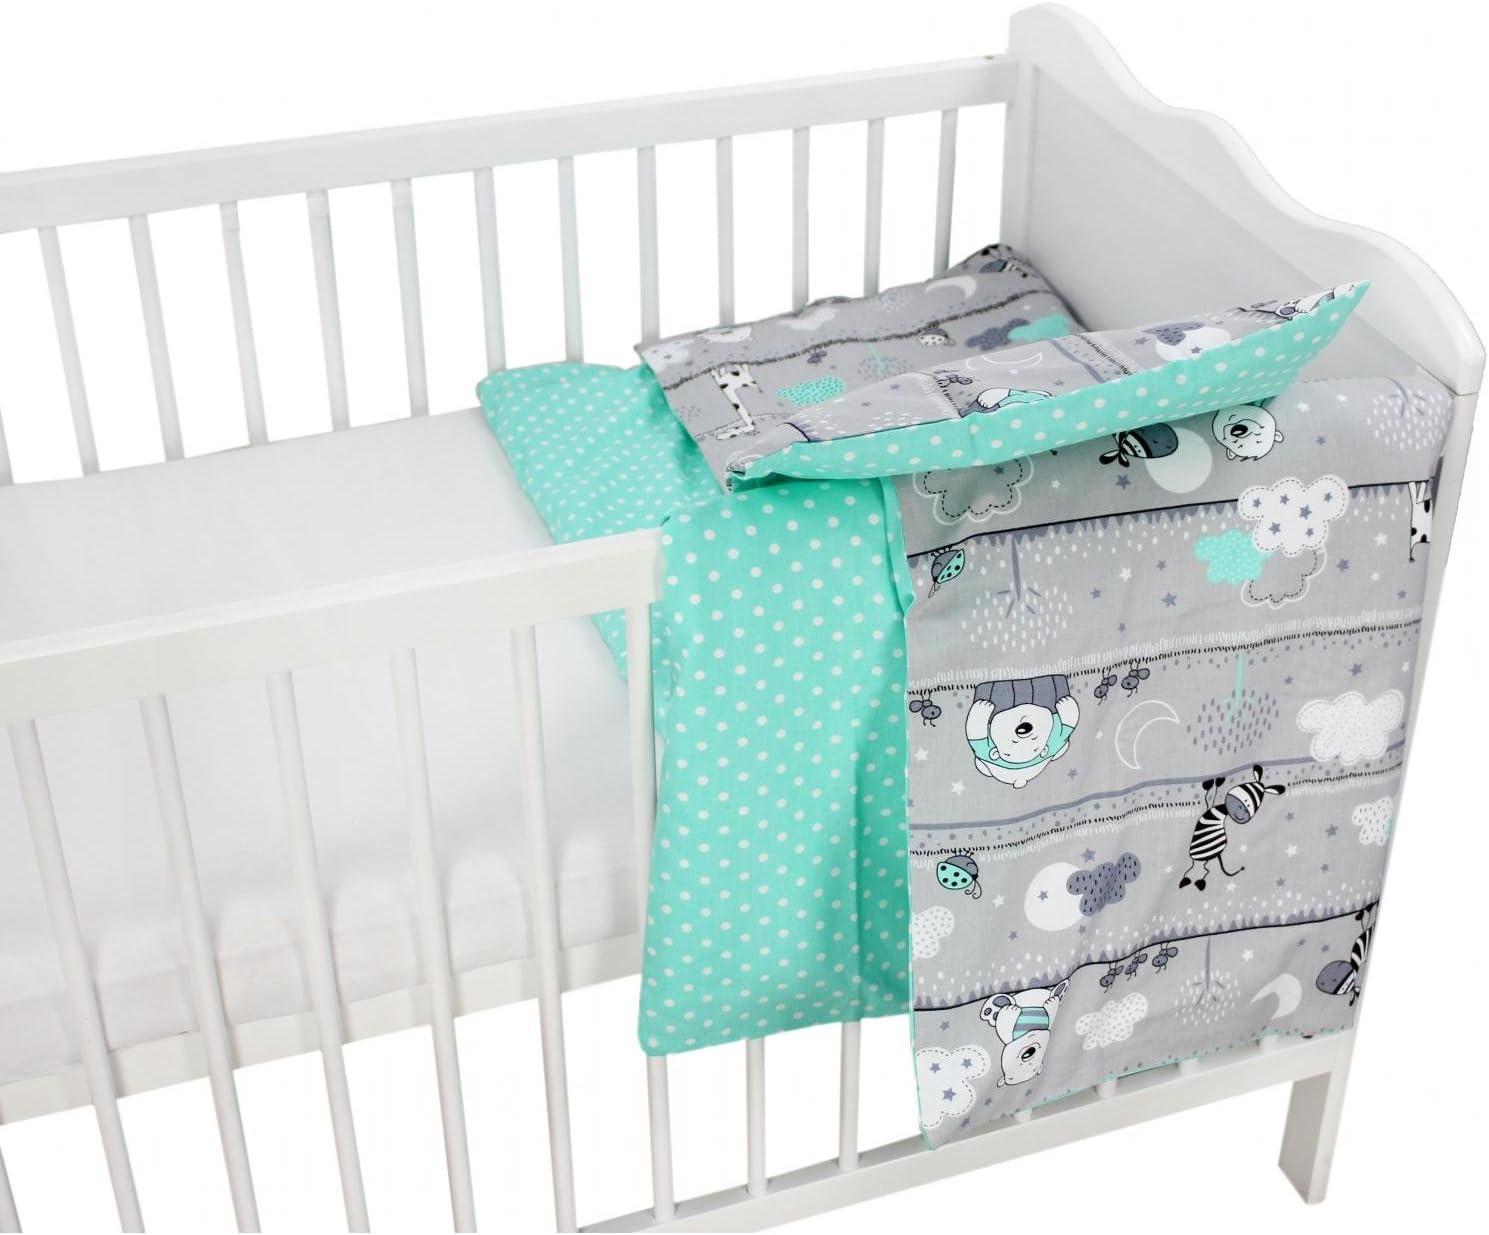 TupTam Children Bedding Set Duvet Cover Pillowcase Two-Sided 135x100 cm Baby Animals Gray//Pink